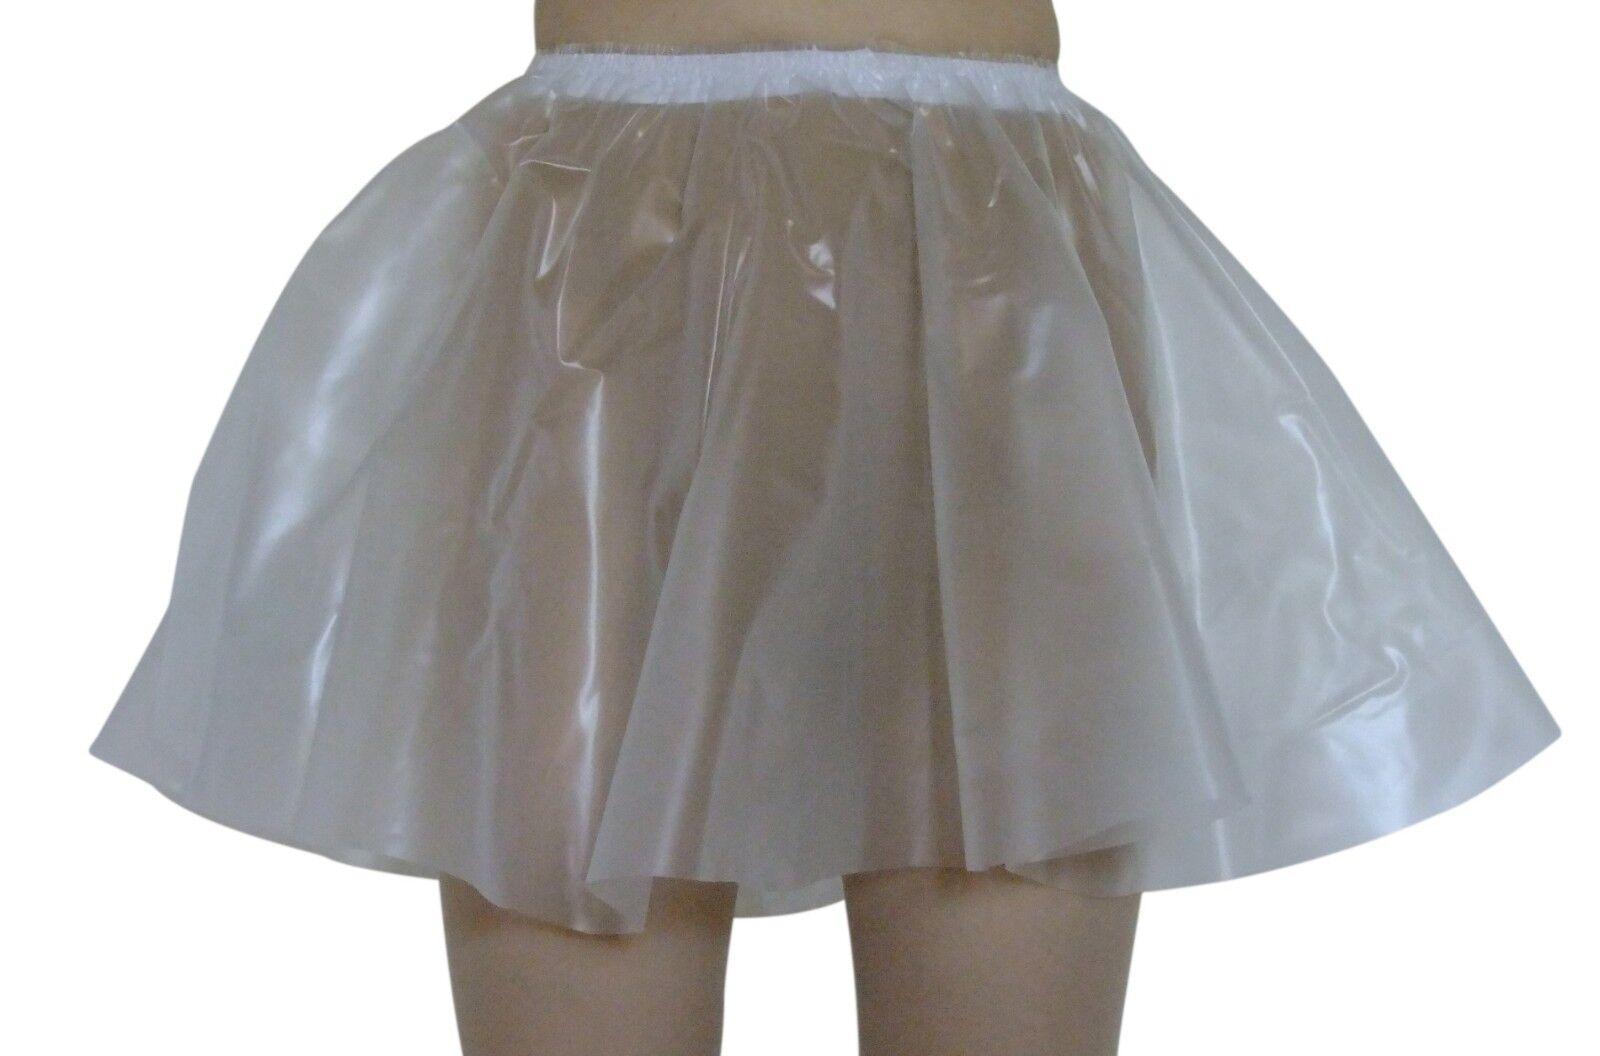 PVC Circle Skirt  Large Semi clear Transparent  Plastic Vinyl  Sissy Flared Full